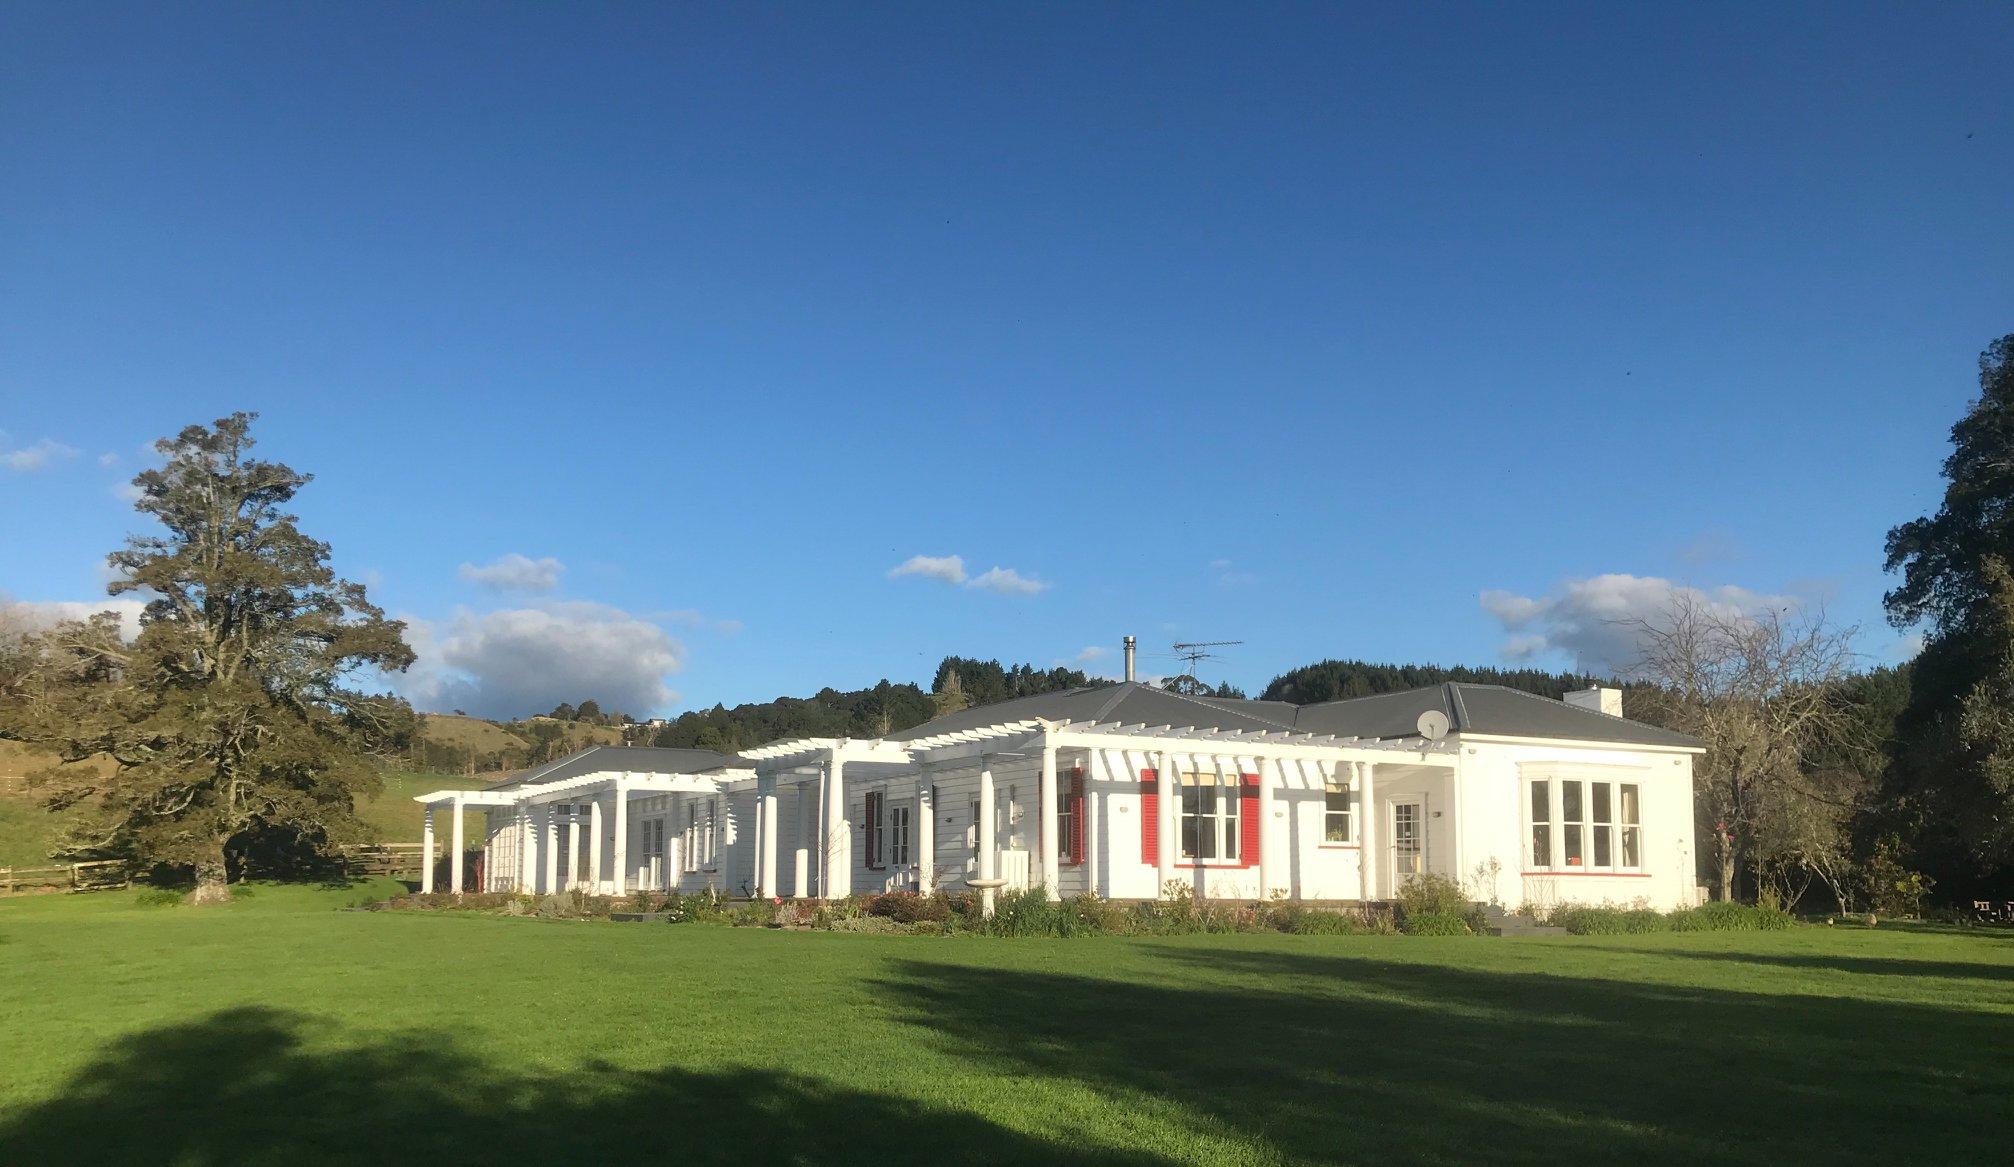 The Country Farmhouse